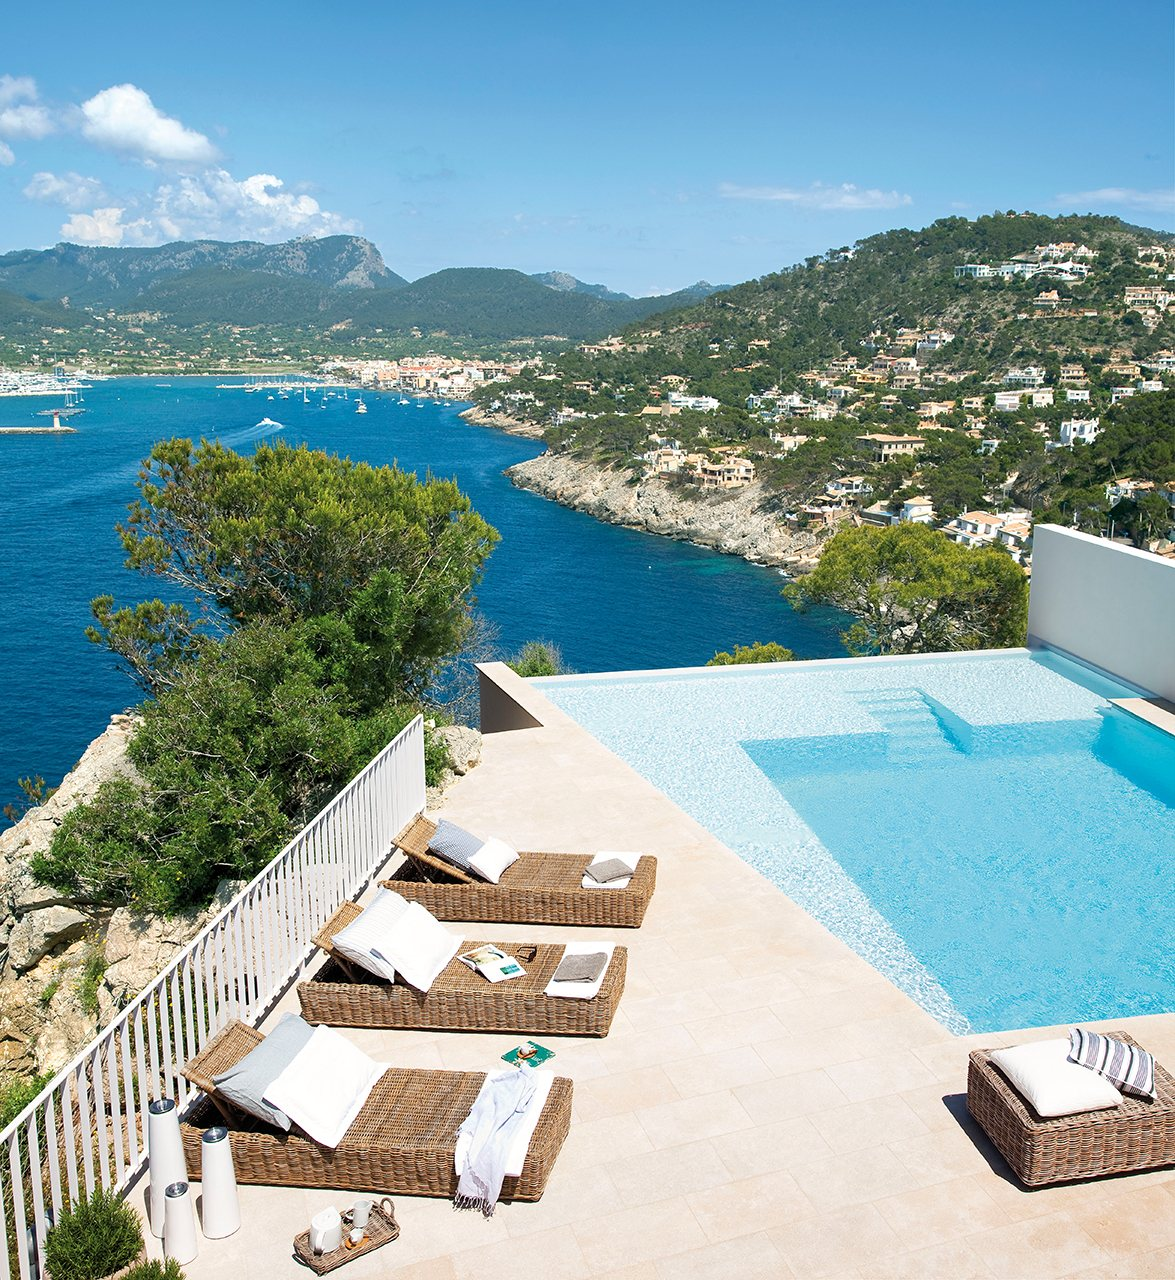 Las mejores piscinas para desconectar este verano for Piscinas espectaculares